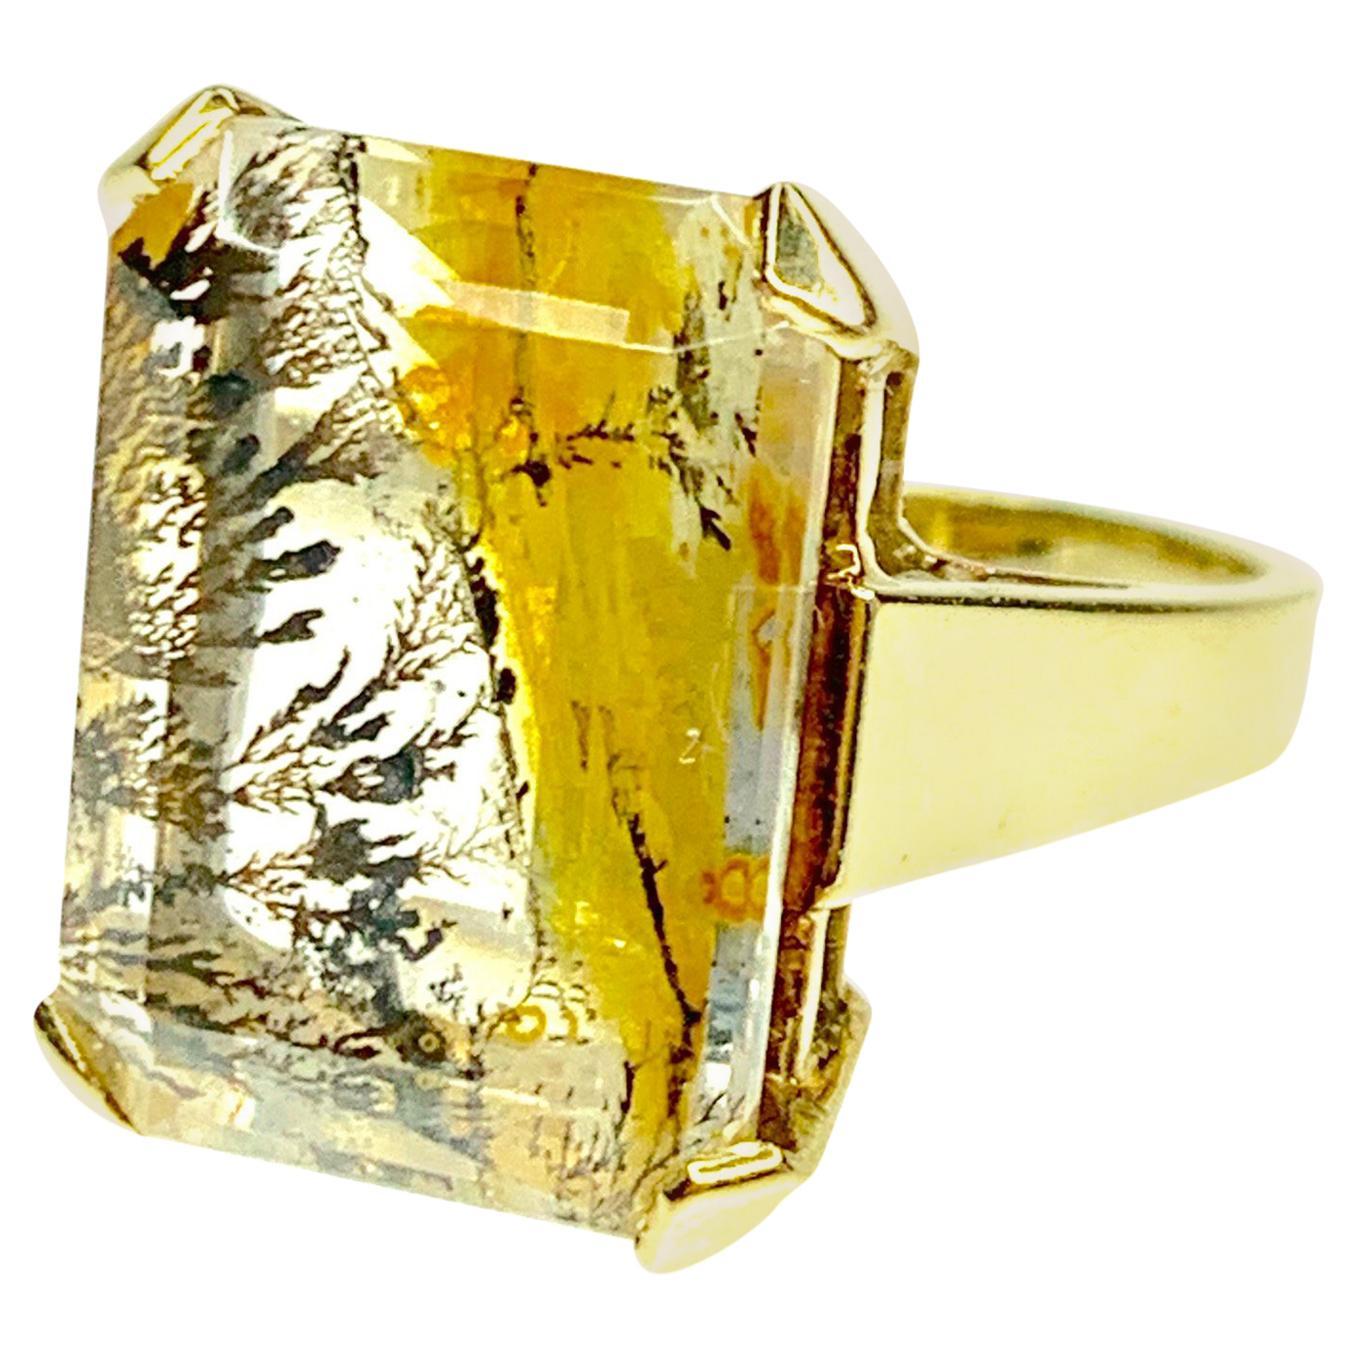 GEMOLITHOS Dendrite Quartz Ring 14 Karat Gold